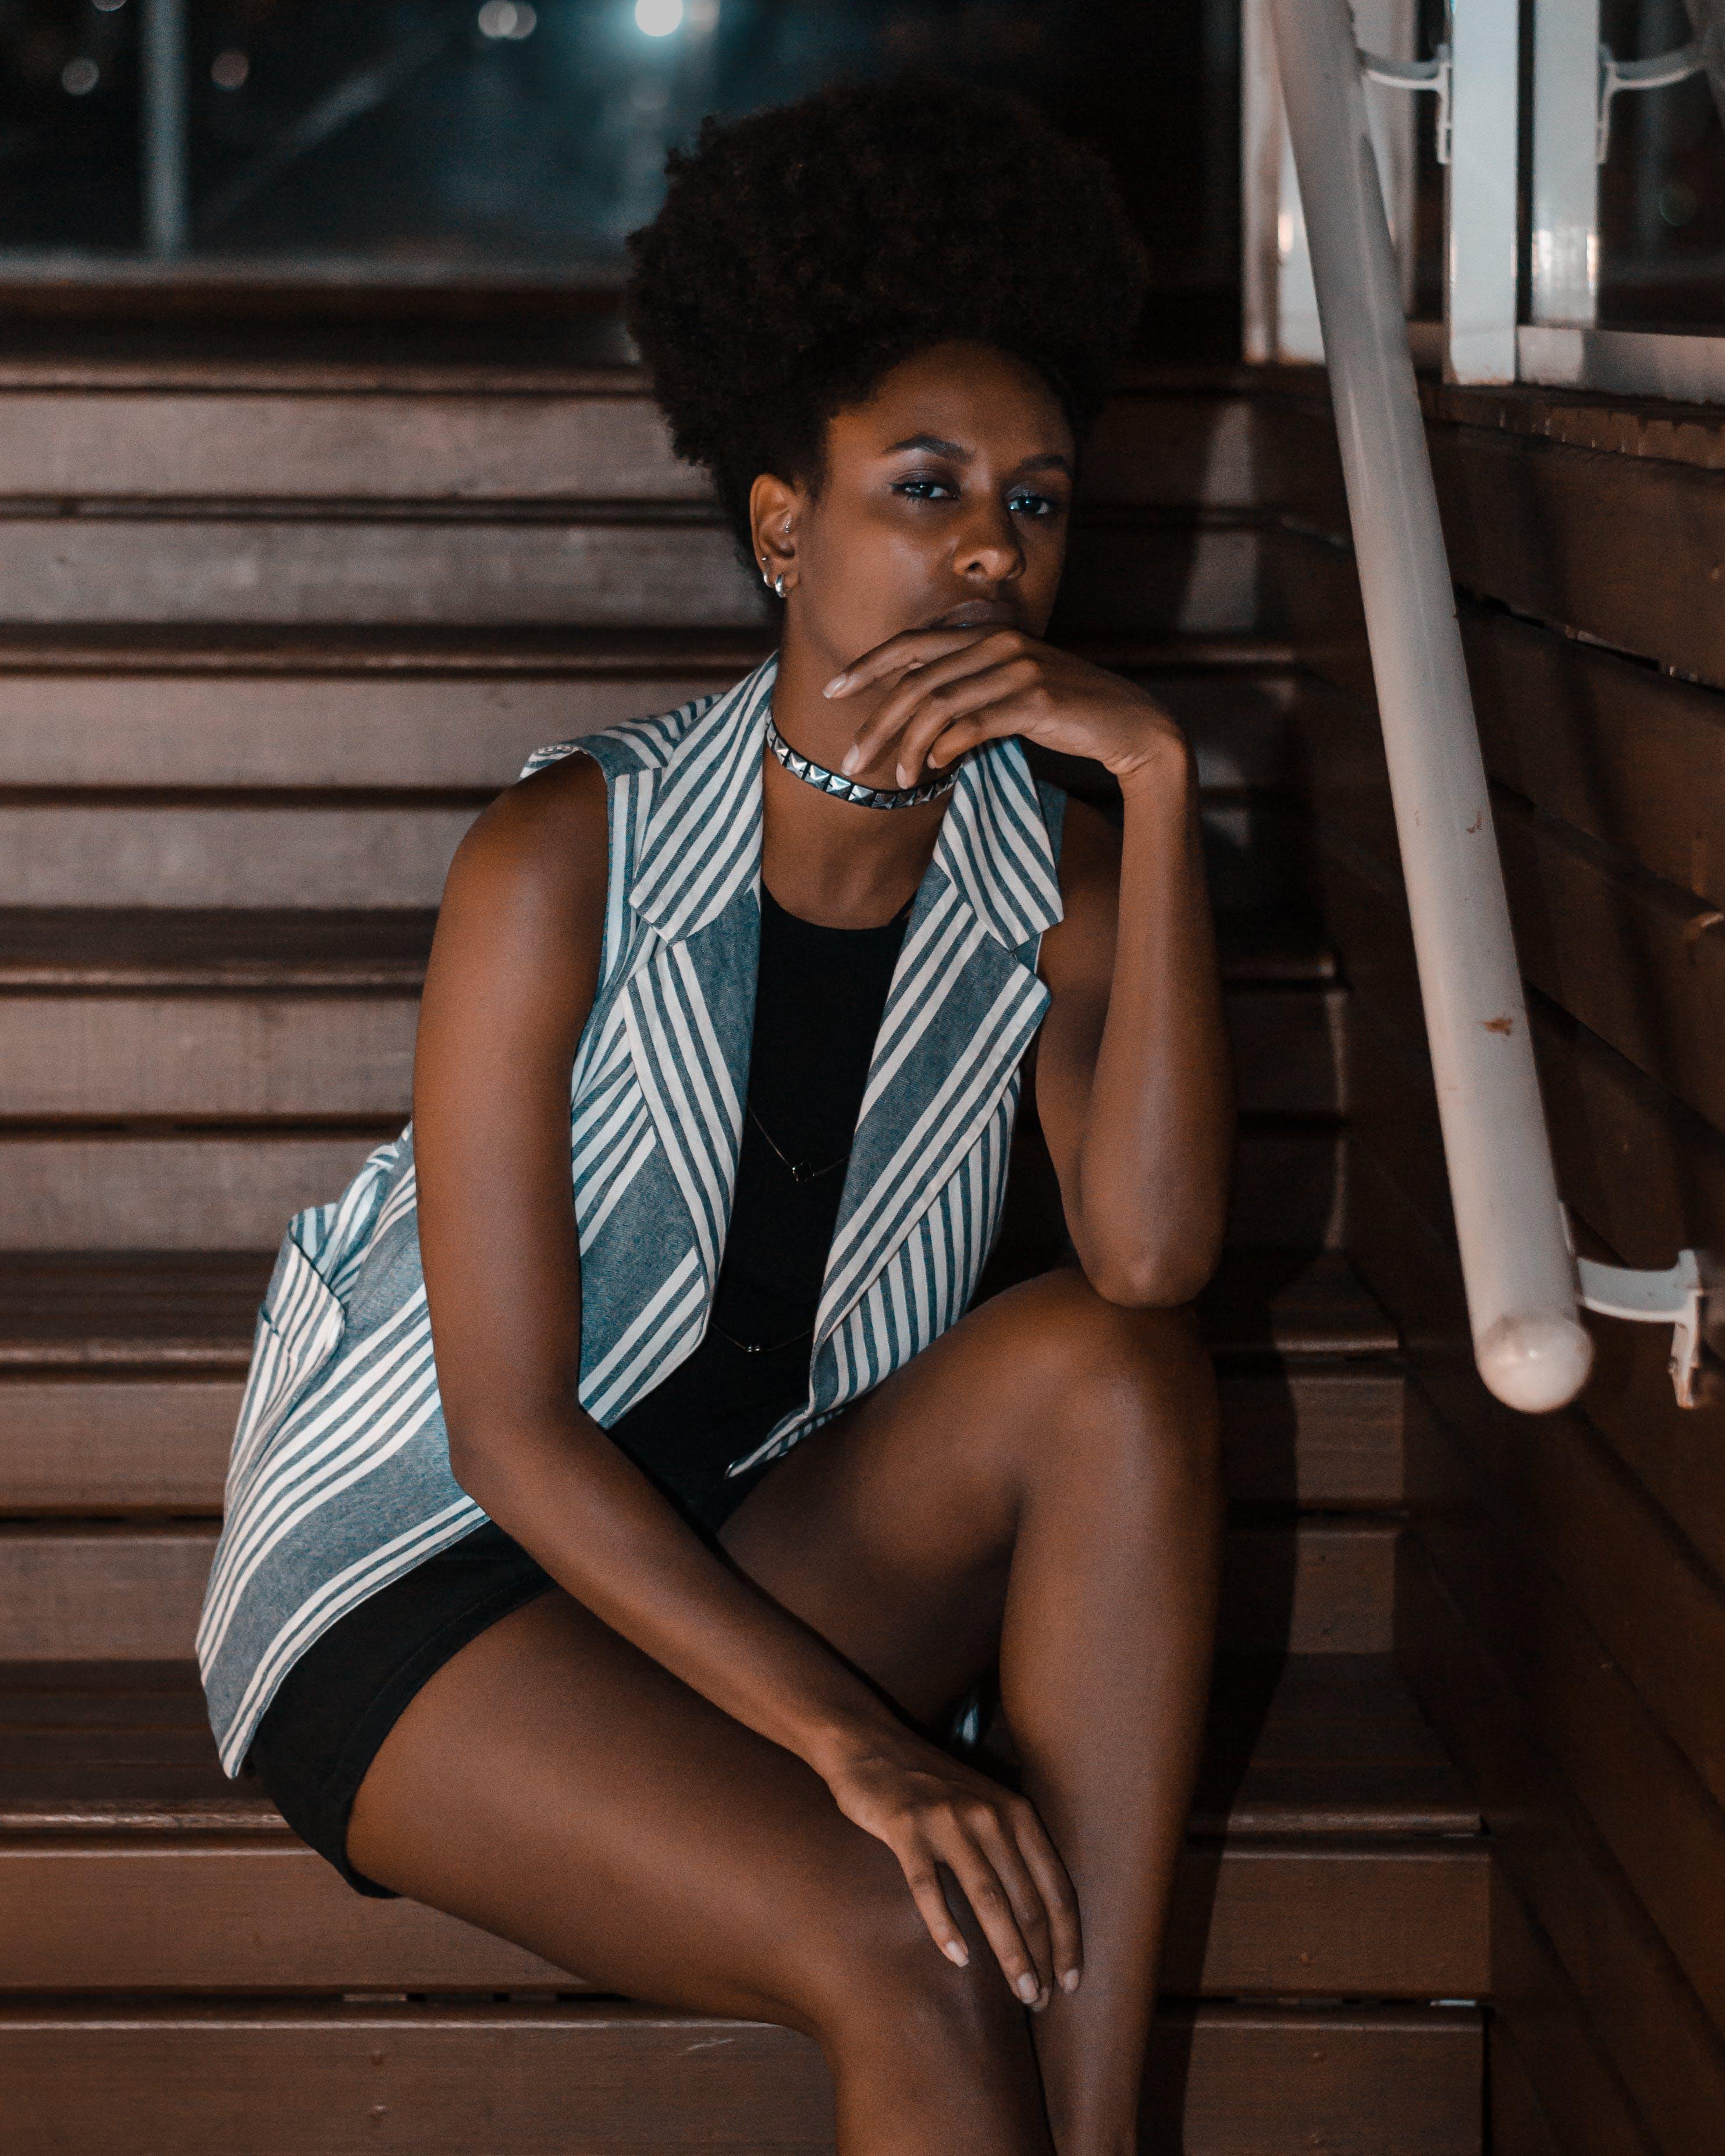 afrikansk amerikan kvinna, afro, ansiktsuttryck